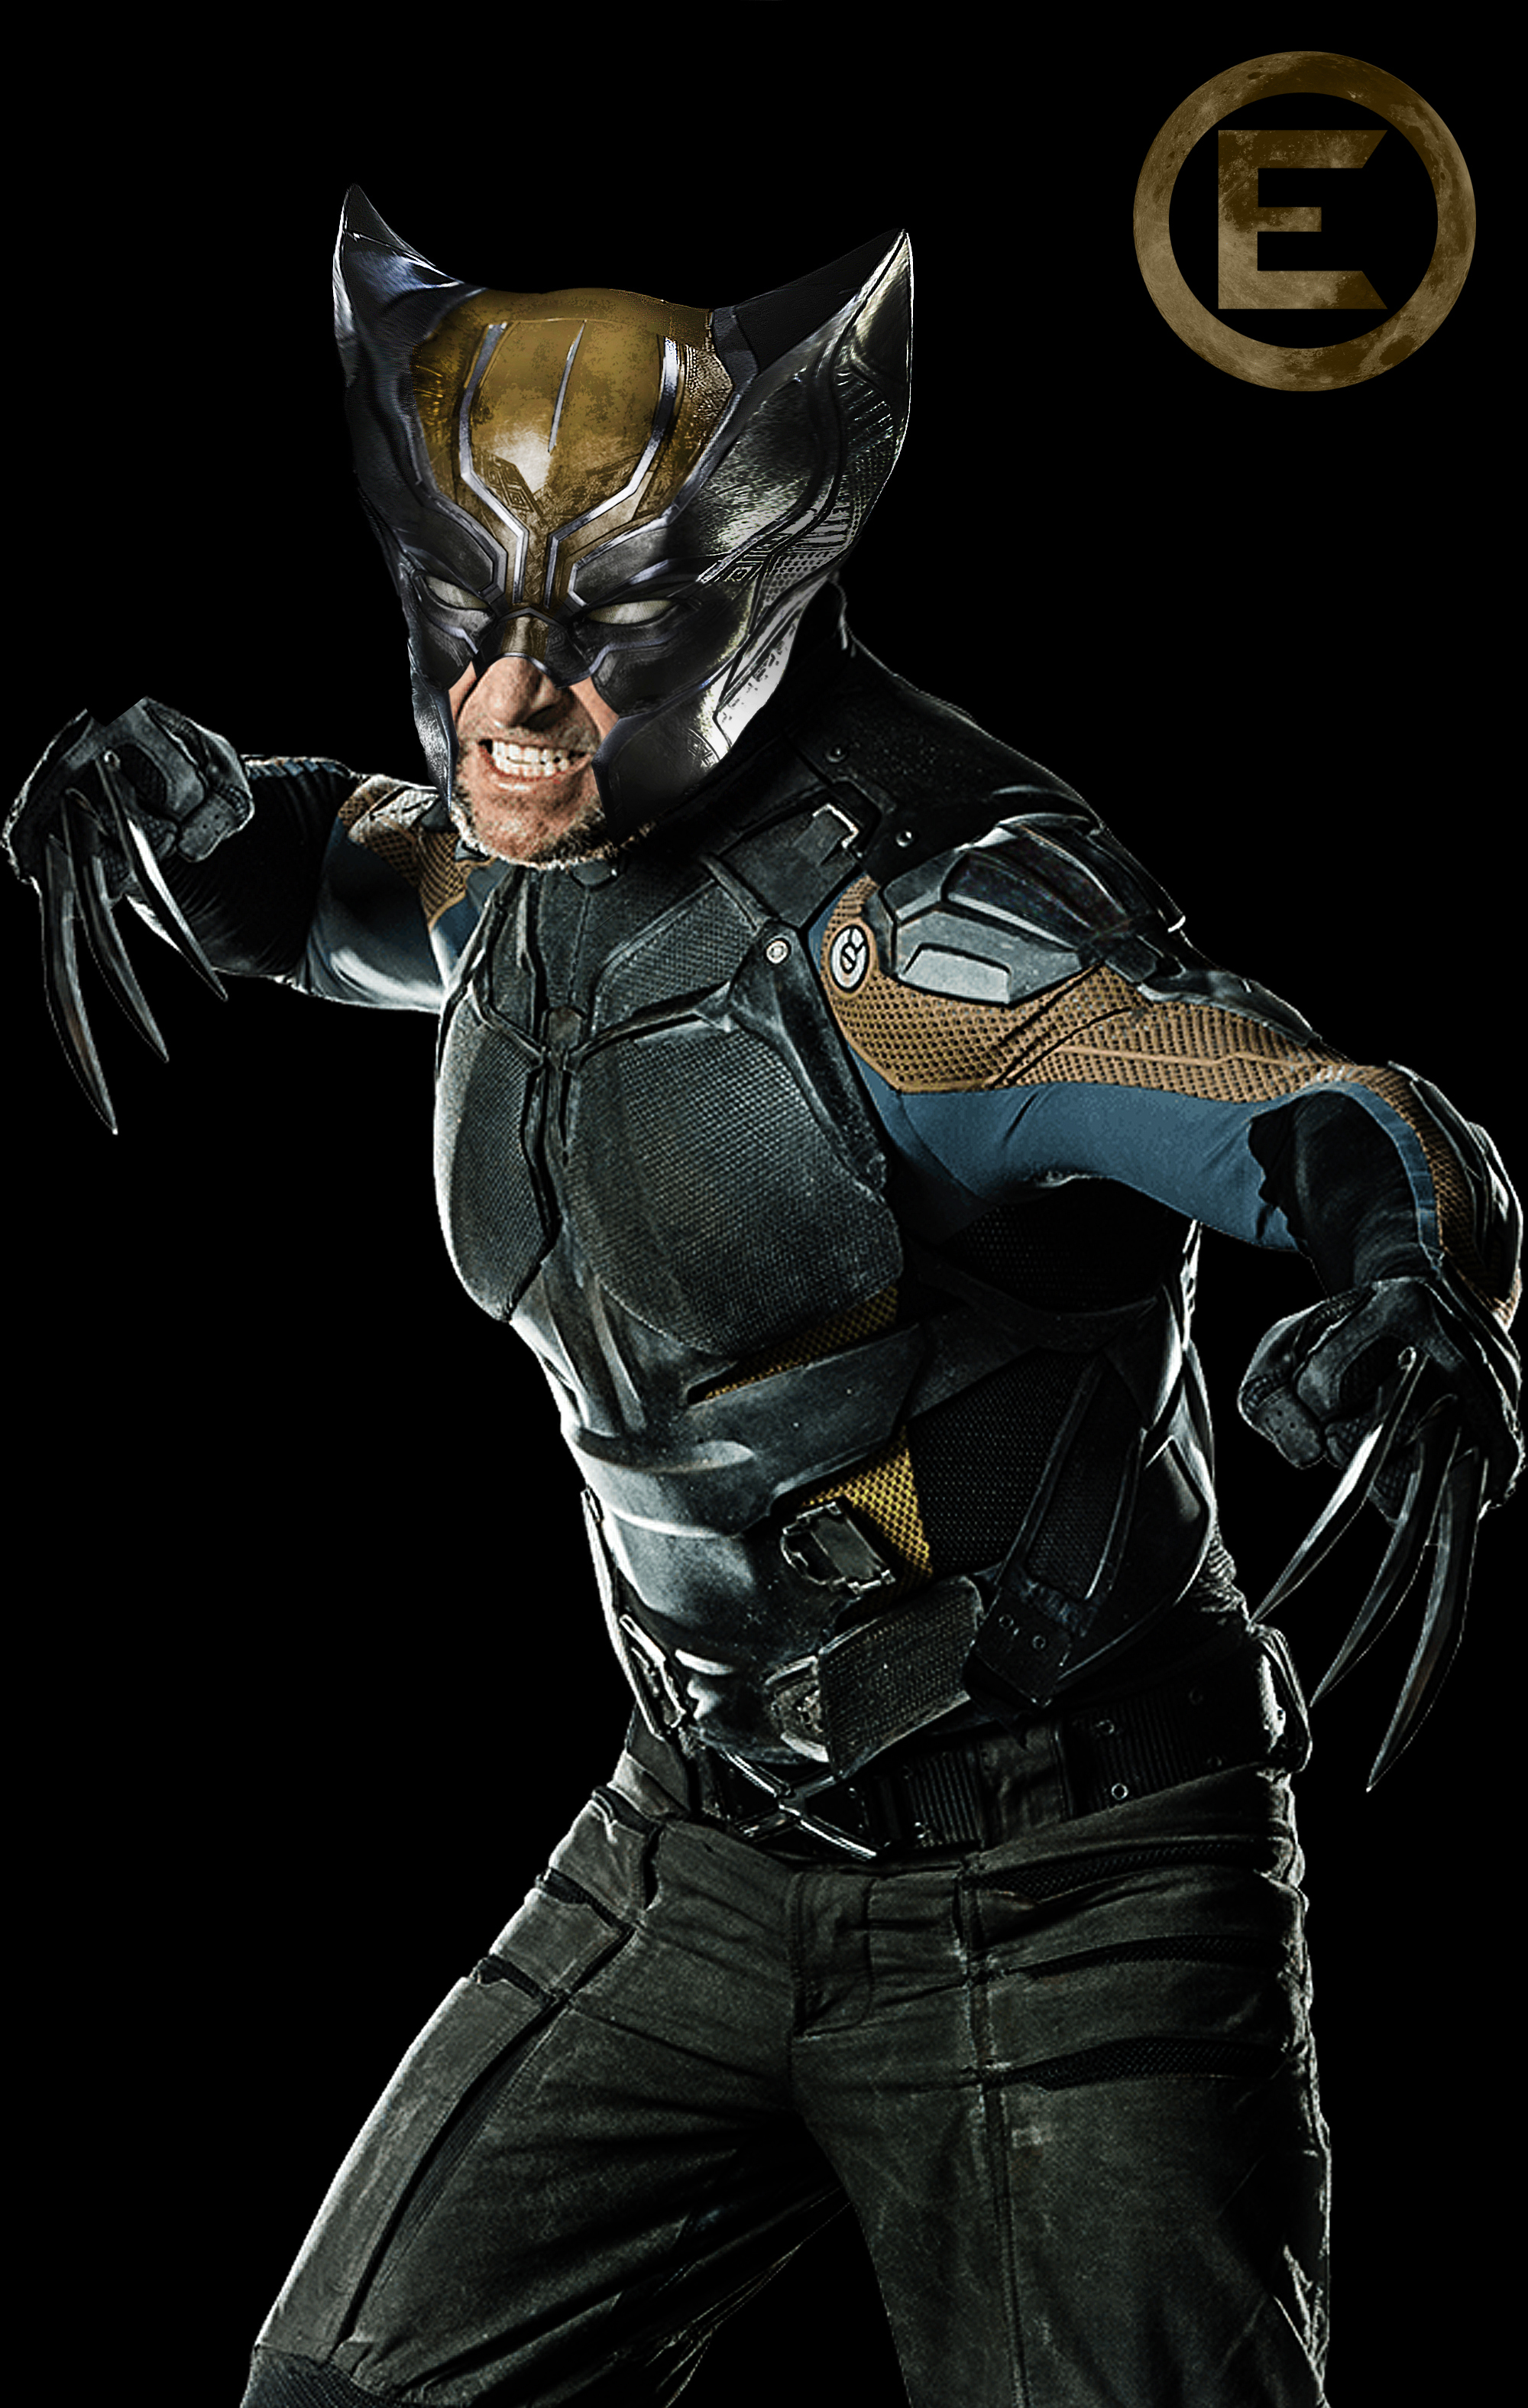 Classic Wolverine live-action concept